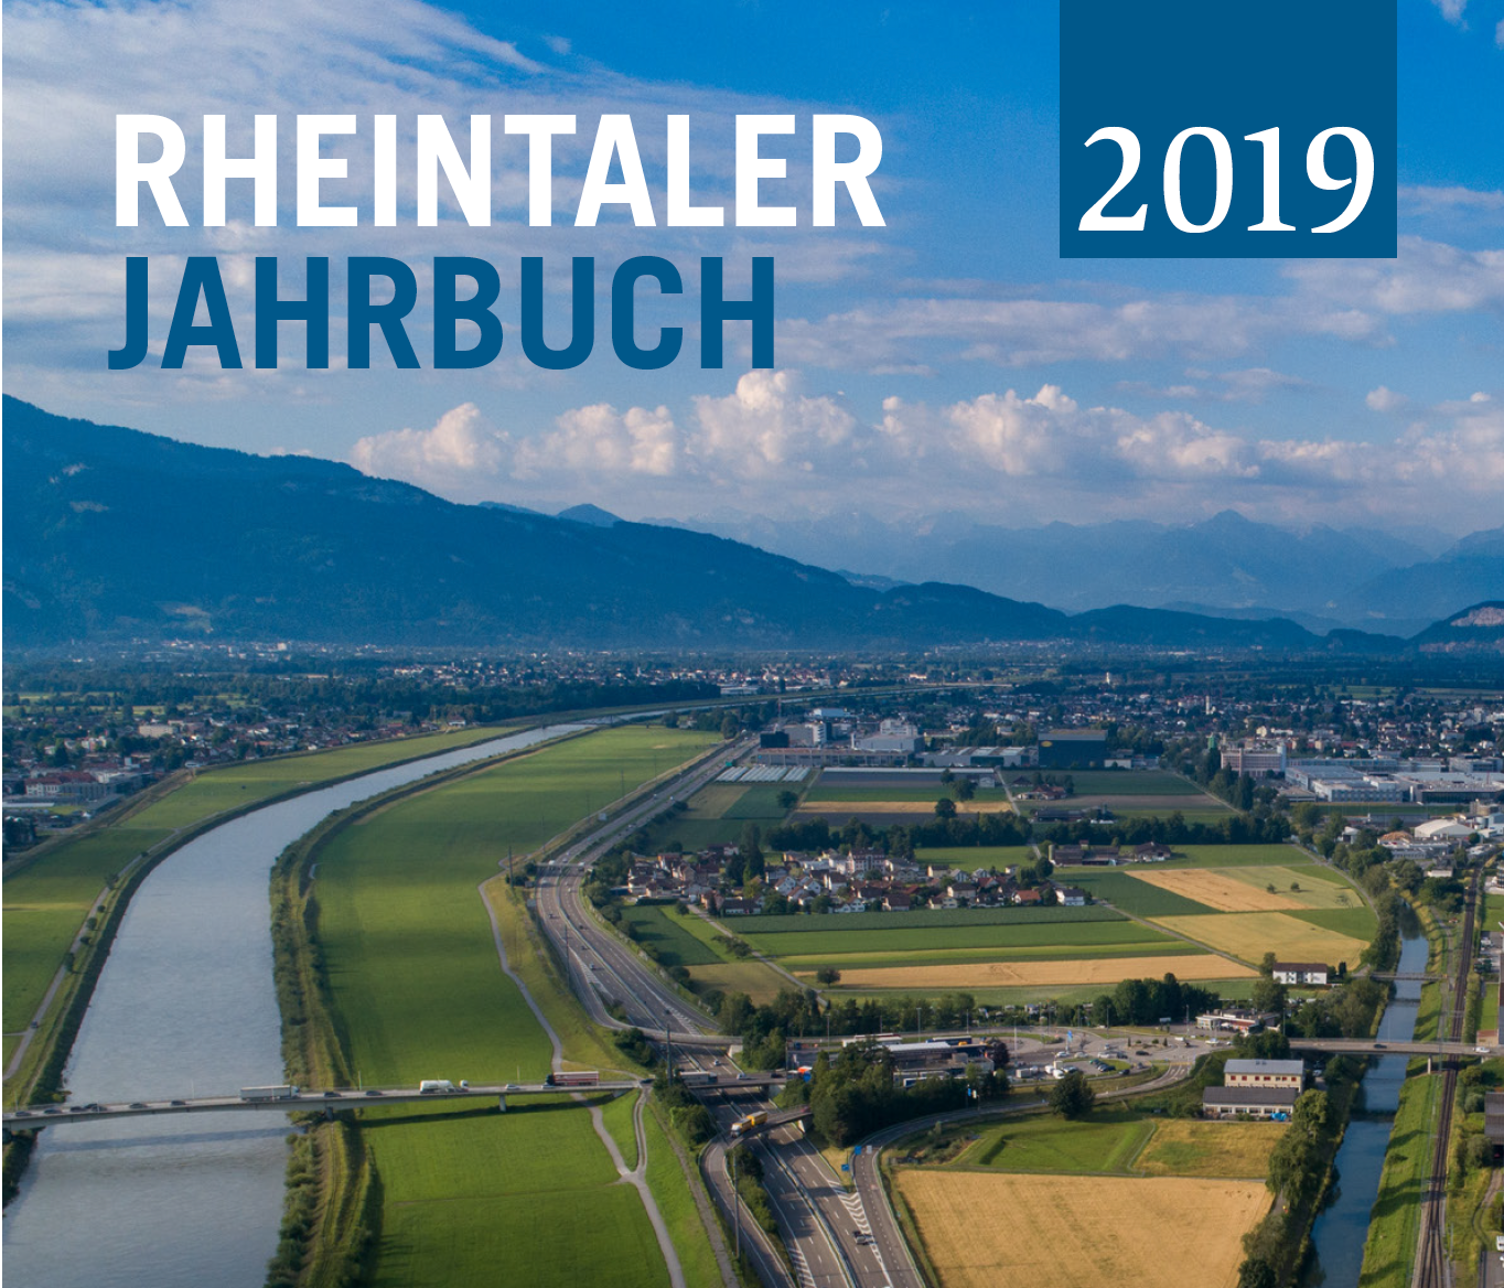 Rheintaler Jahrbuch